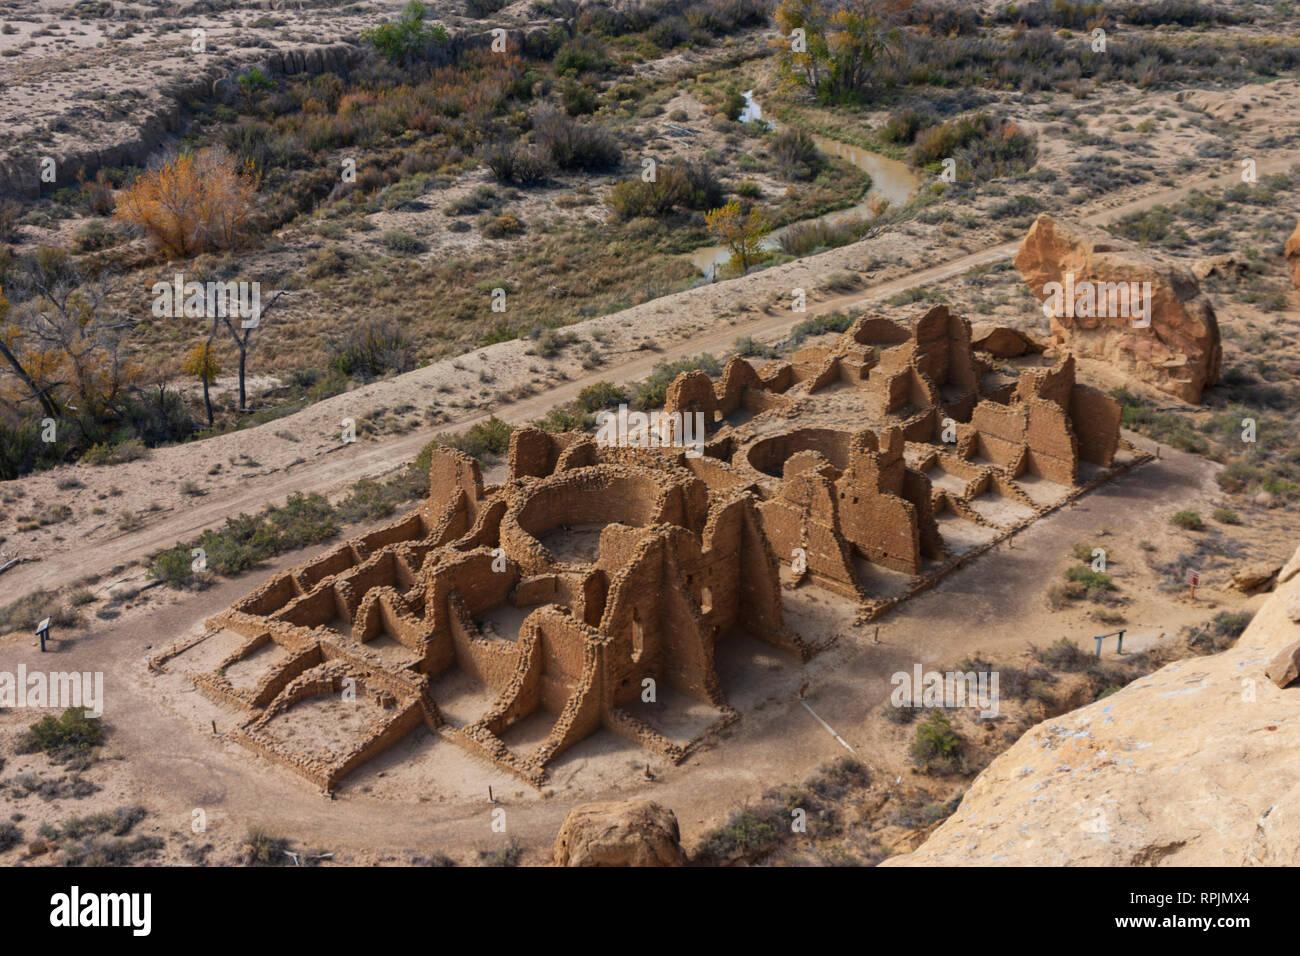 An areal view of Pueblo Bonito at Chaco Canyon, New Mexico Stock Photo